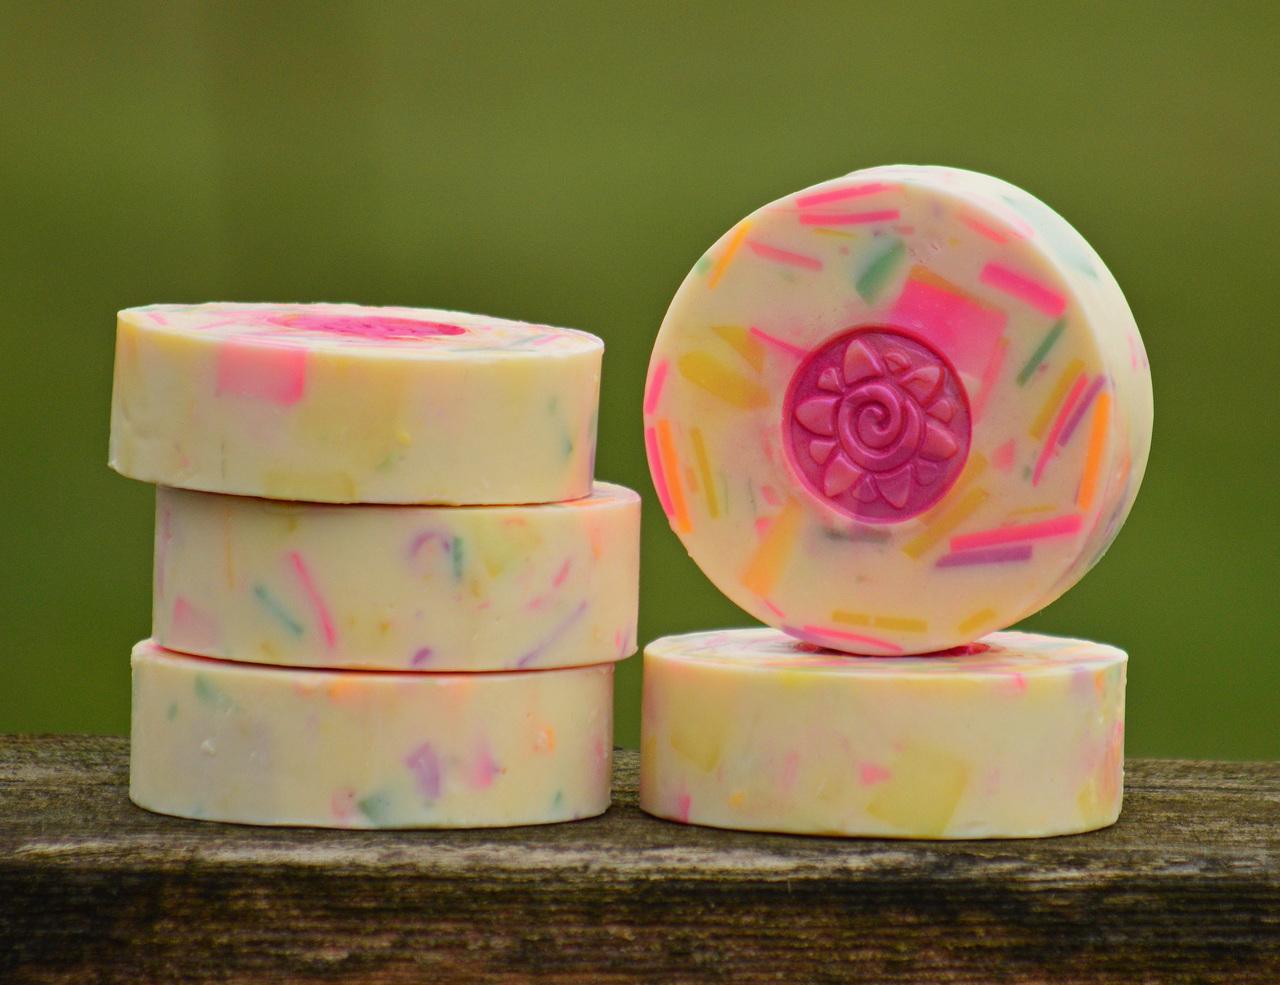 Hawaiian Spring Classic Goat Milk Soap - Limited Edition